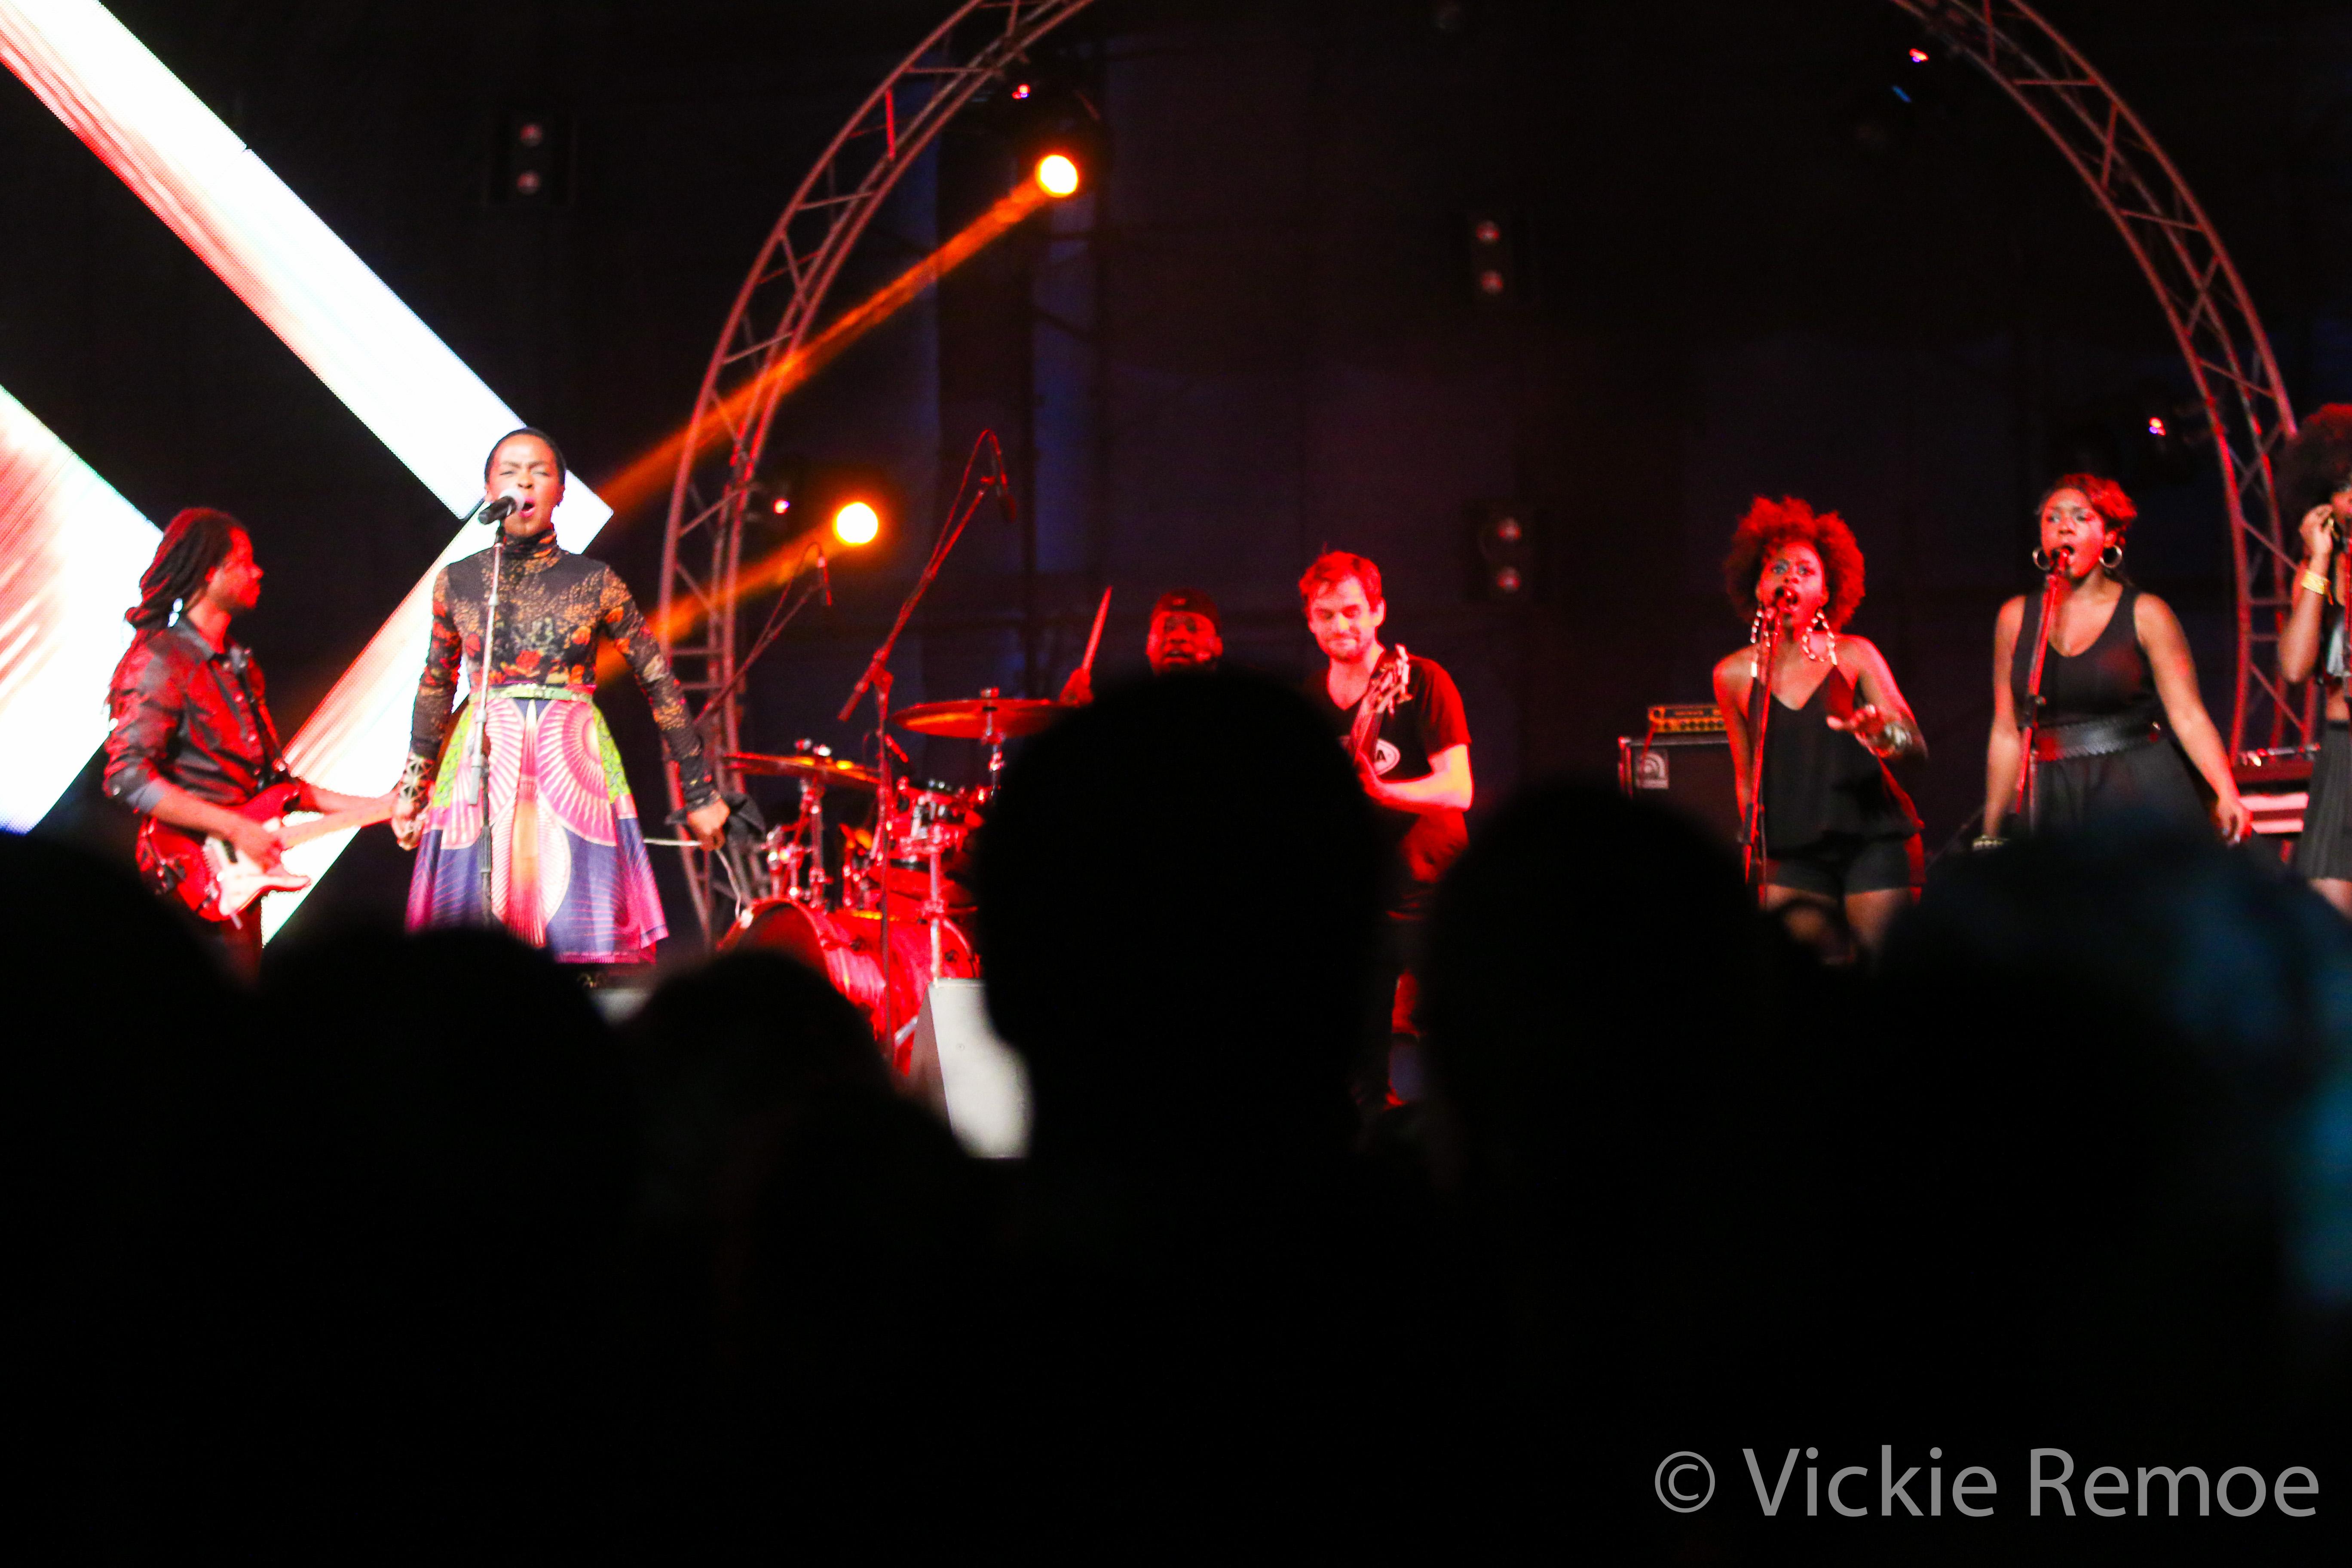 LaurynHillinGhana_Wanlov_BBNZ-Concert_StoneBoy-MissV-2014-9